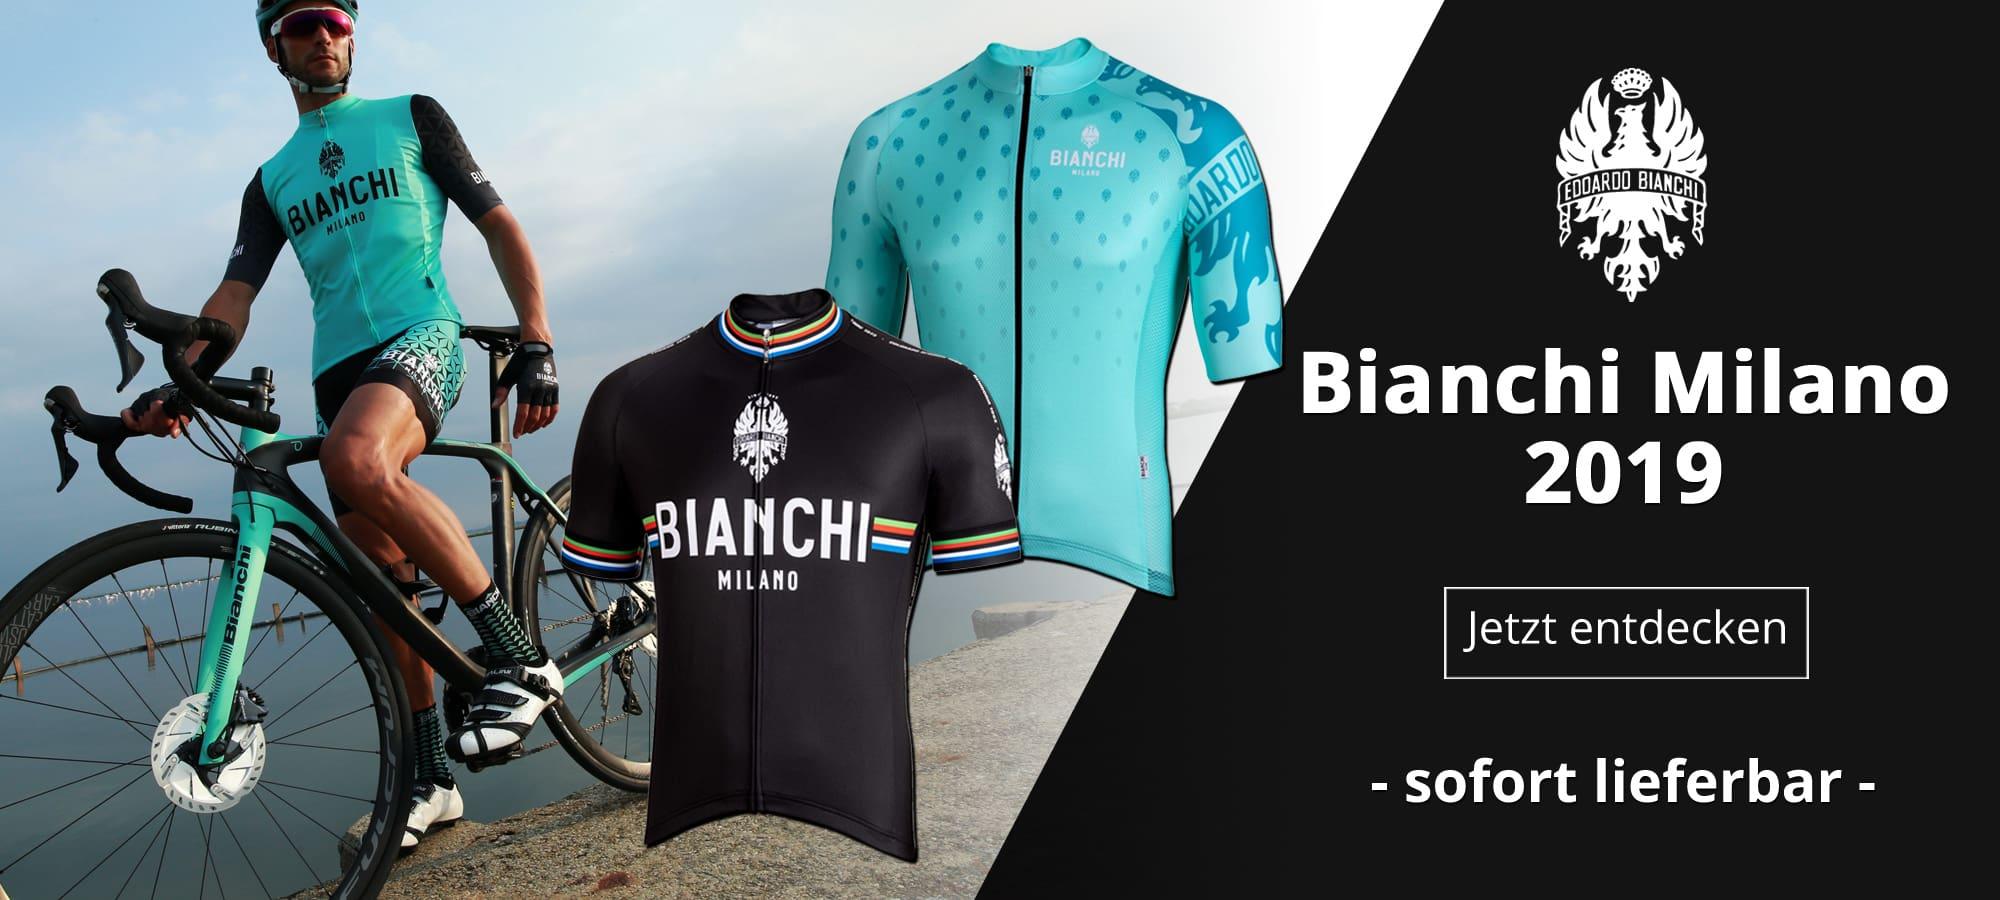 Bianchi Milano Frühling/Sommer 2019 ab sofort lieferbar